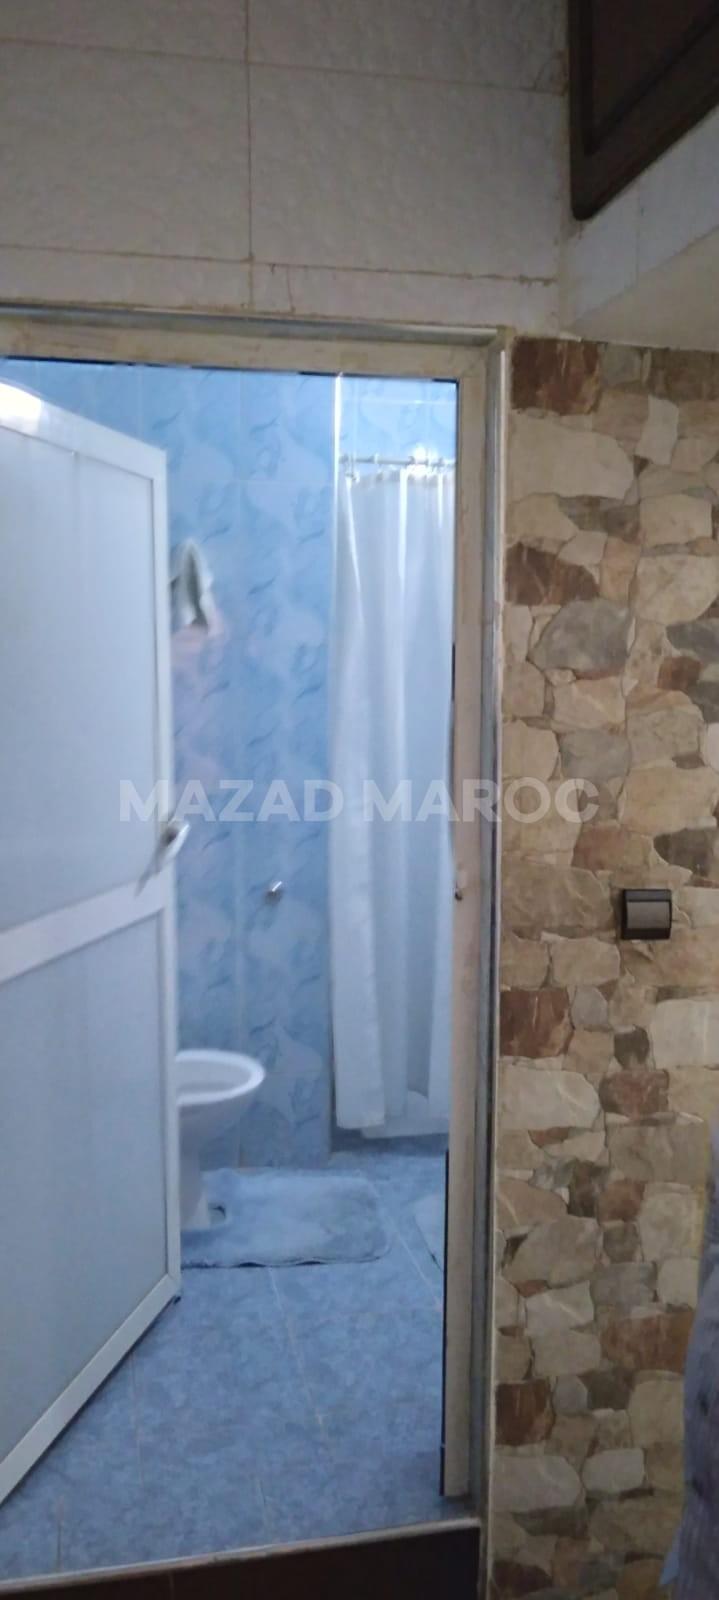 Appartement a vendre a temara 67 m2